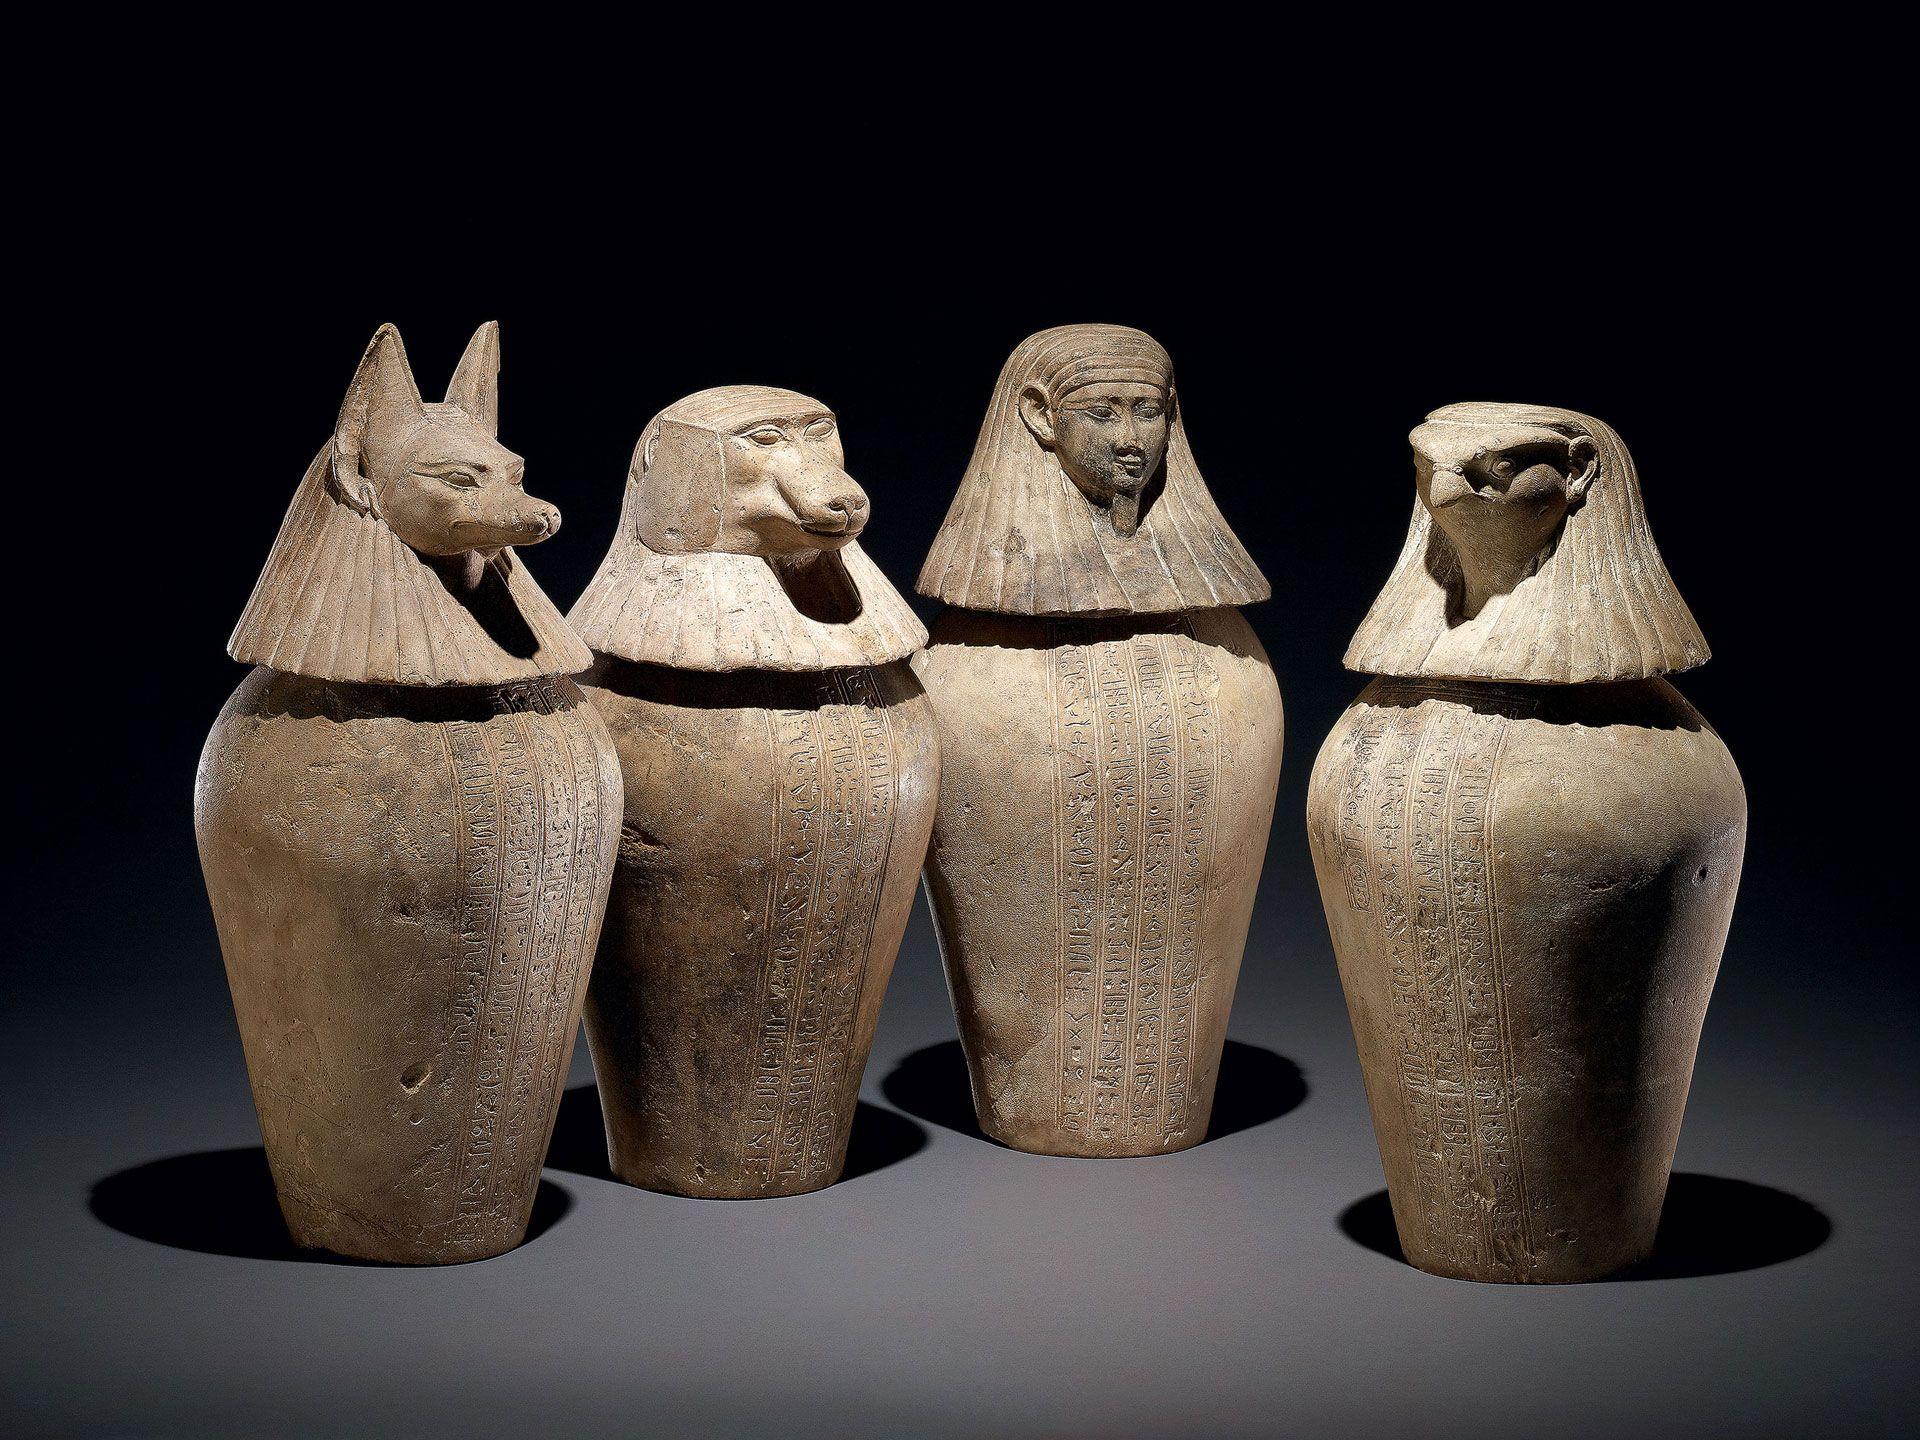 Canopic jar of Djedbastetiuefankh, 30th Dynasty